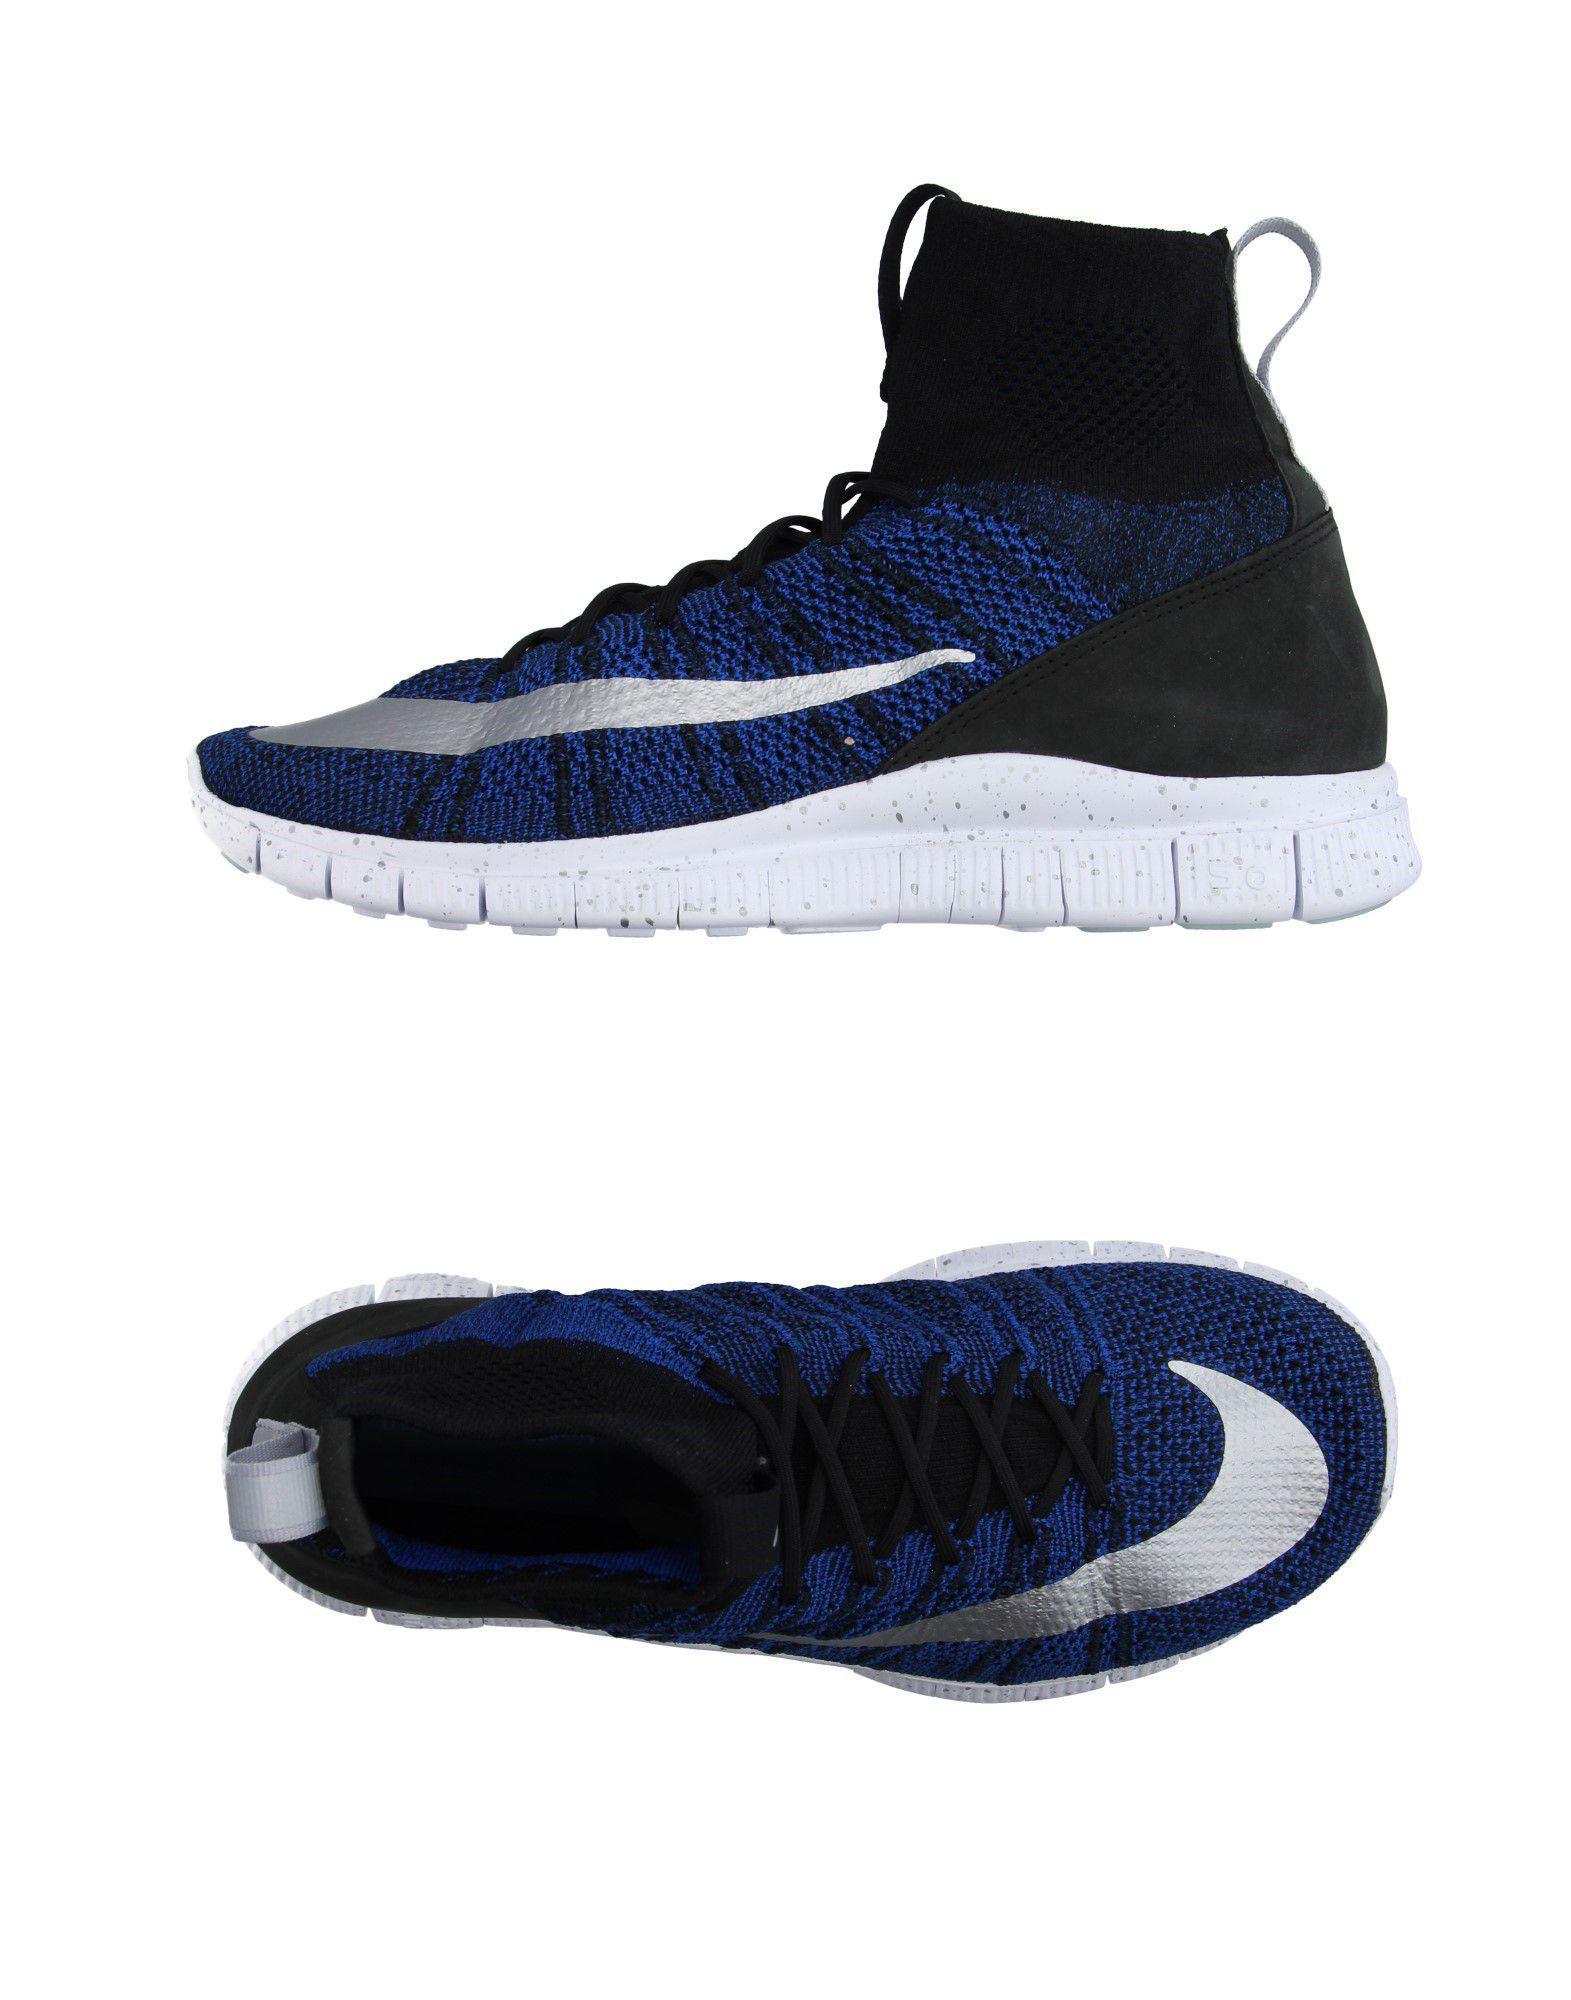 Nike Air Blue High Top Fabric Shoes